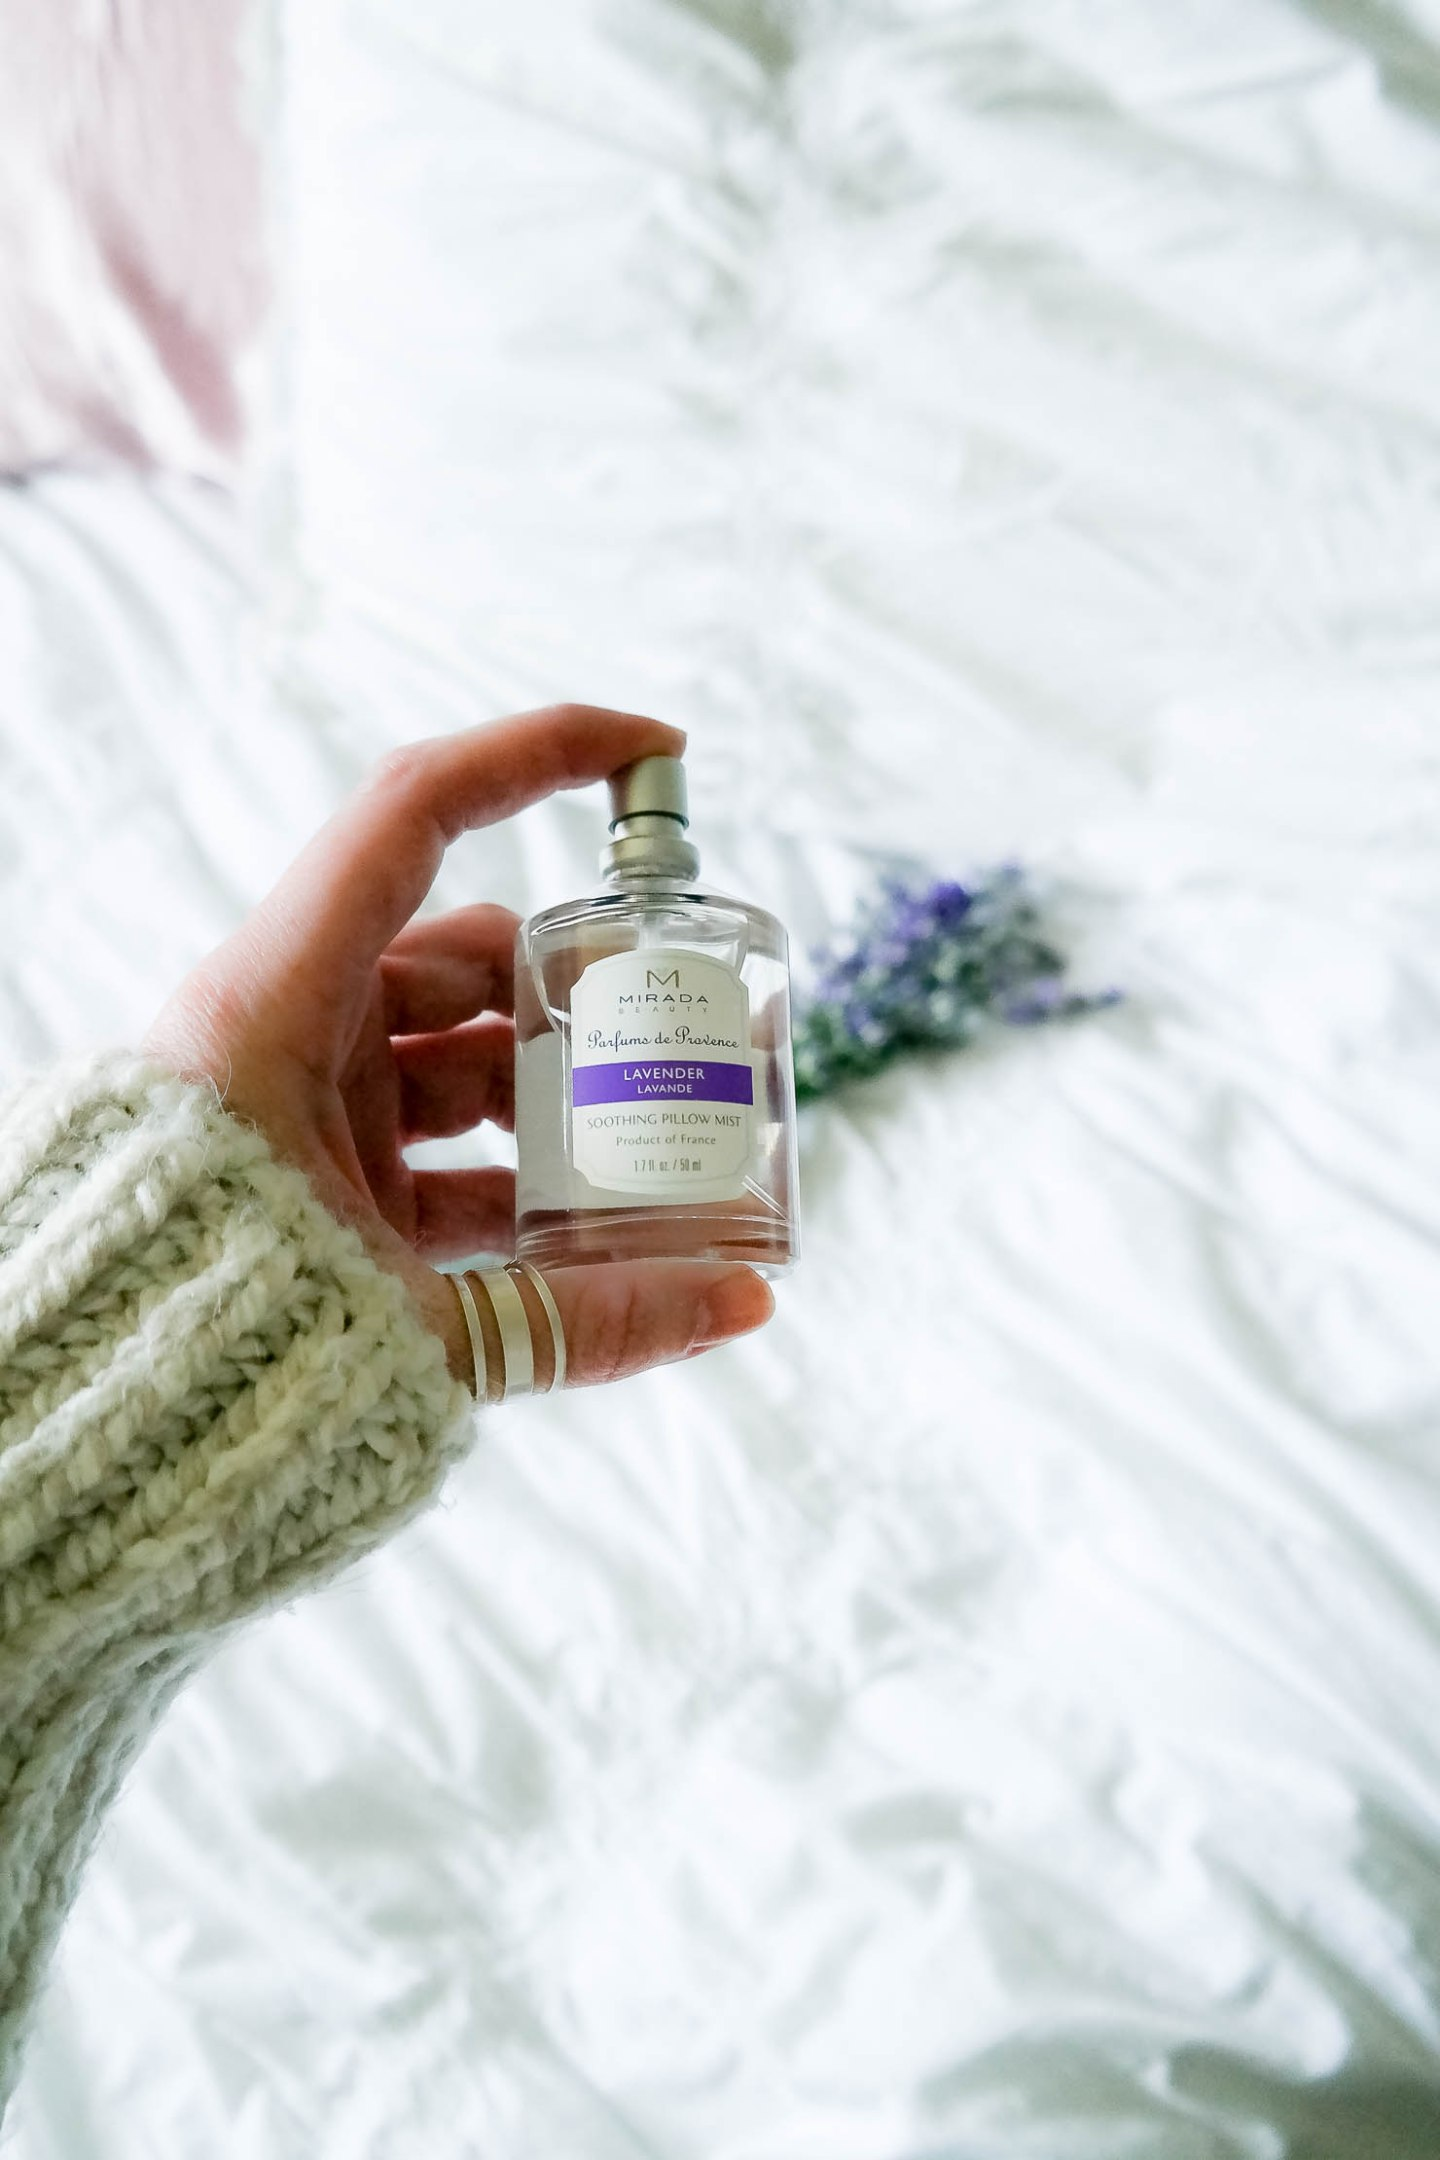 mirada-de-provence-power-of-scent-aromatherapy-lavender-body-care-beauty